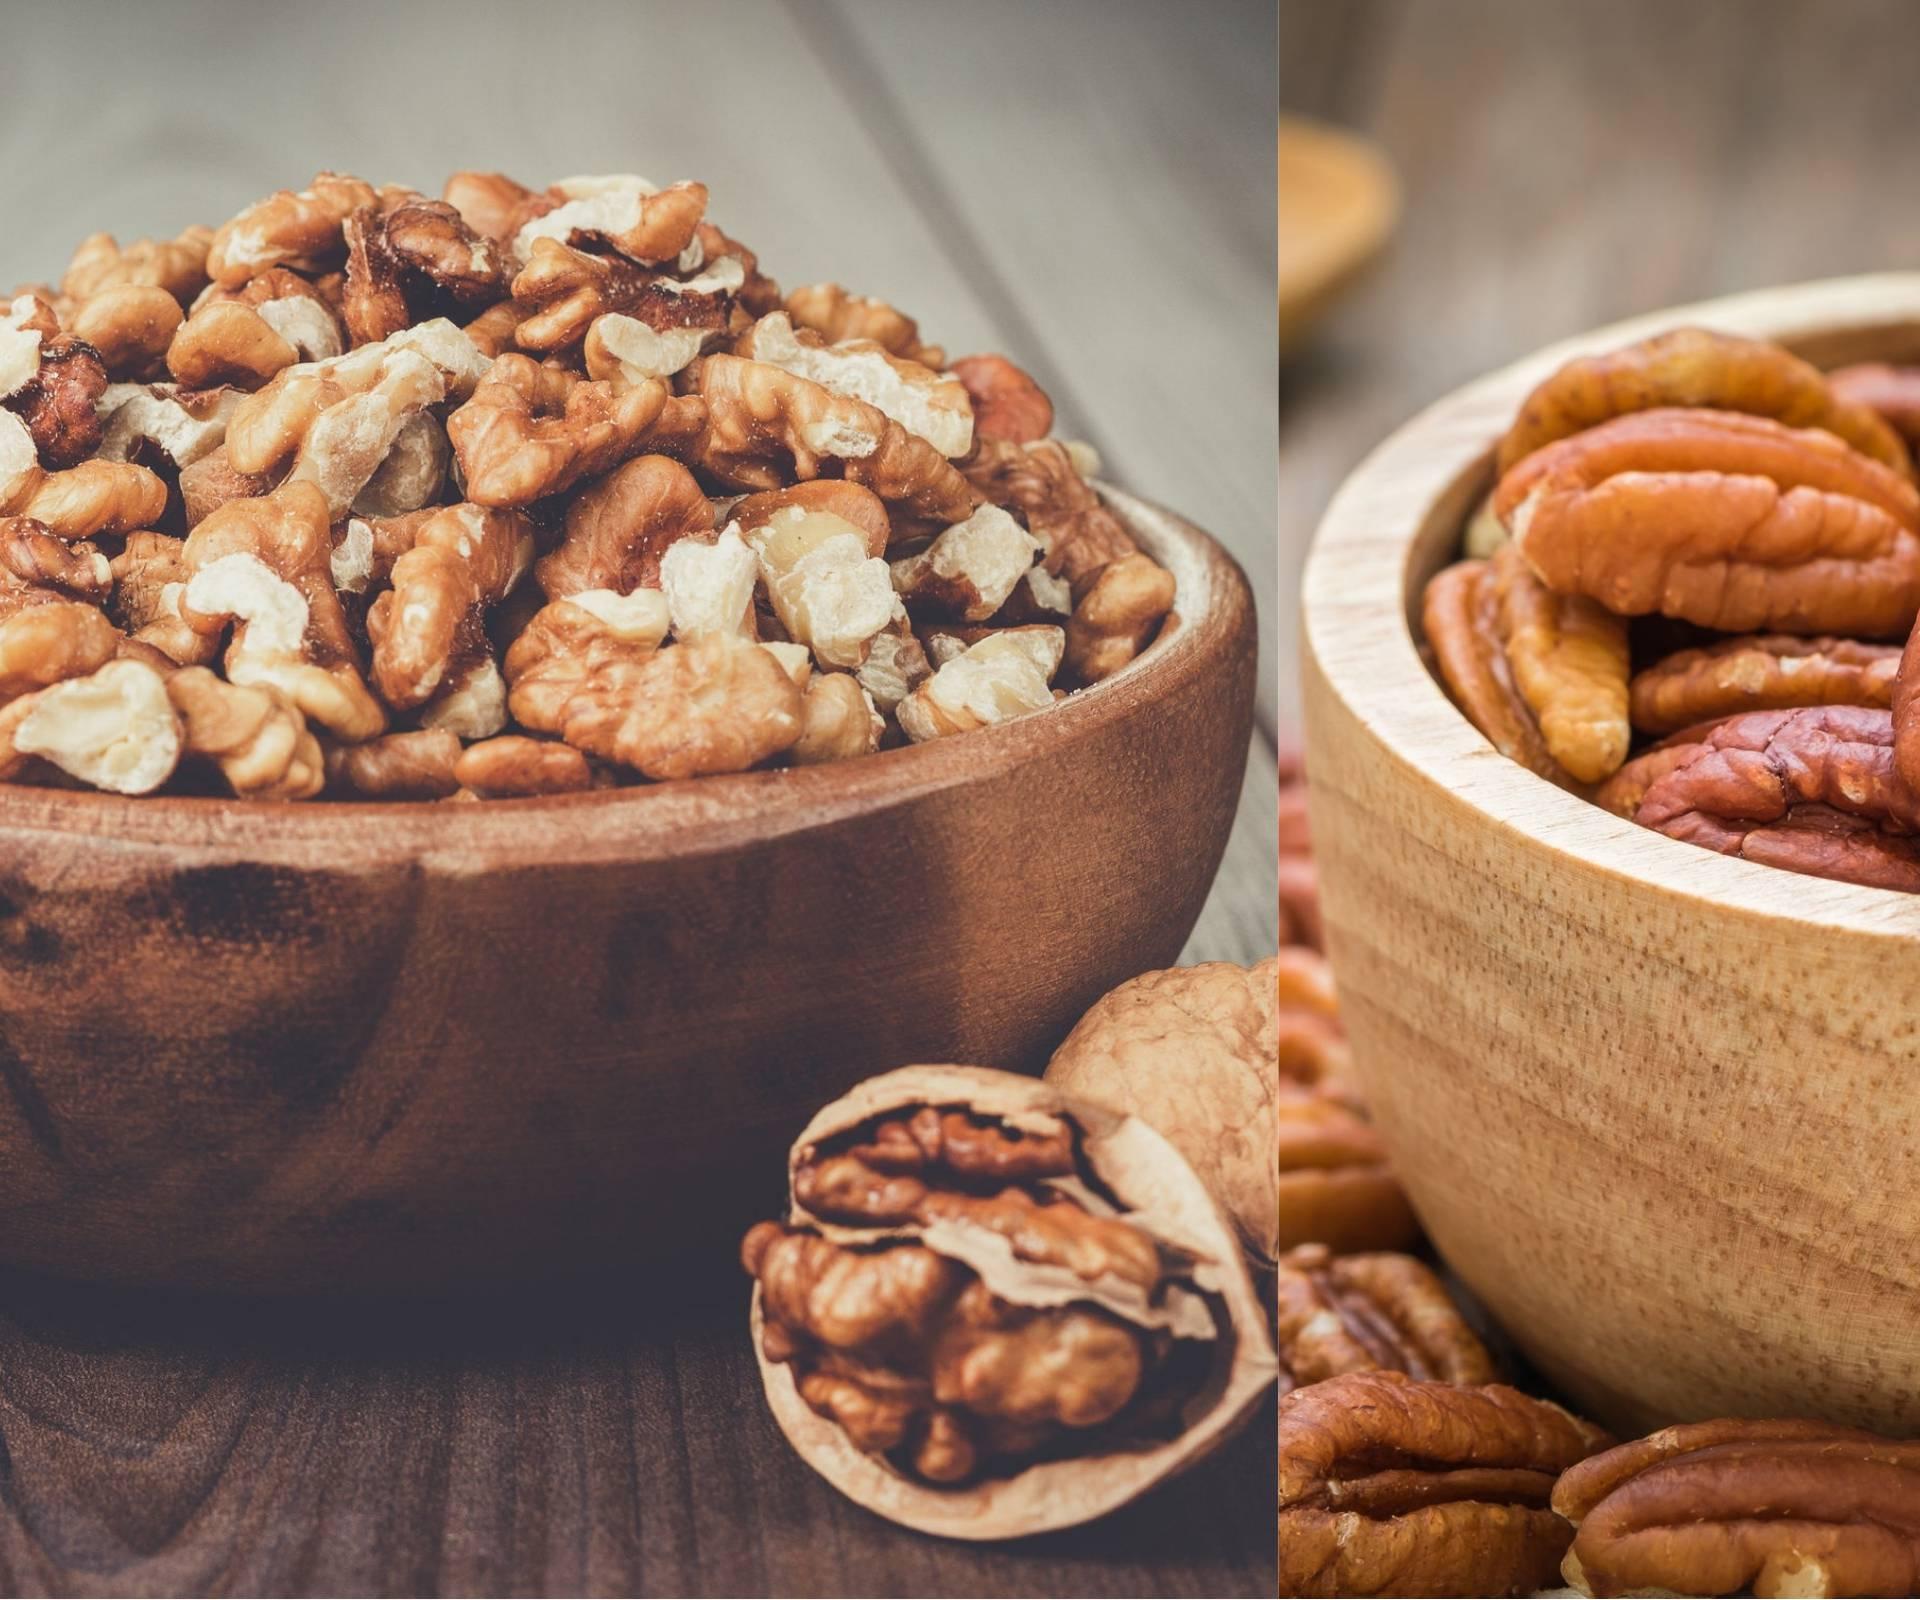 Naši domaći orasi su bogatiji proteinima od pekan oraha